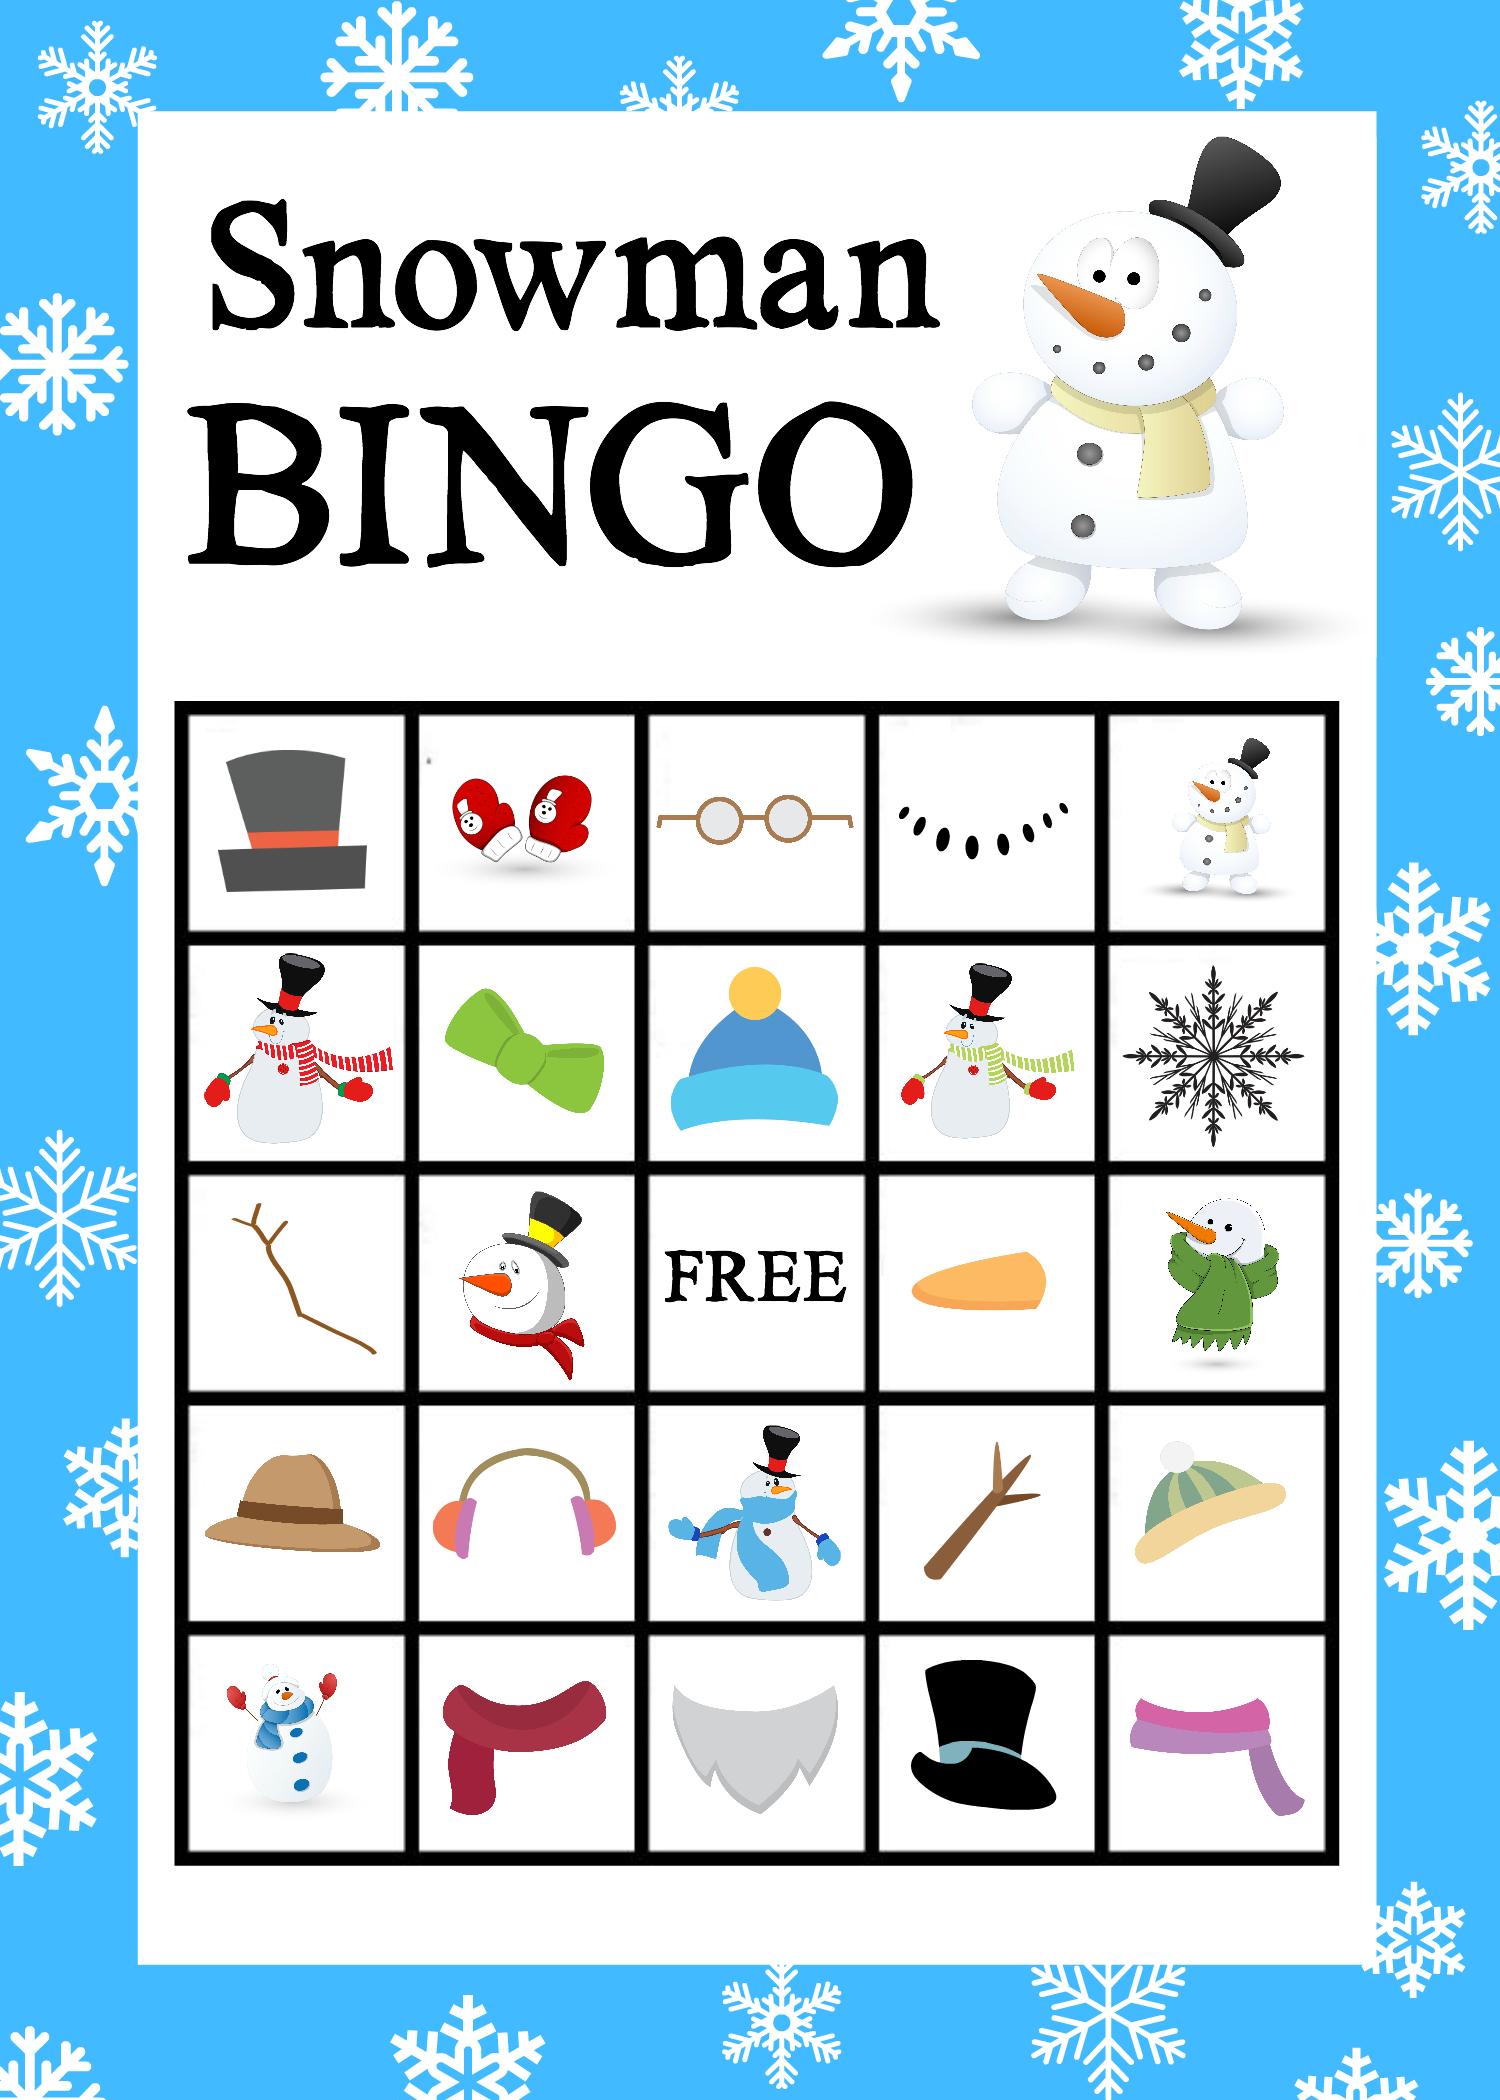 Printable Snowman Bingo Game - Crazy Little Projects - Free Bingo Patterns Printable